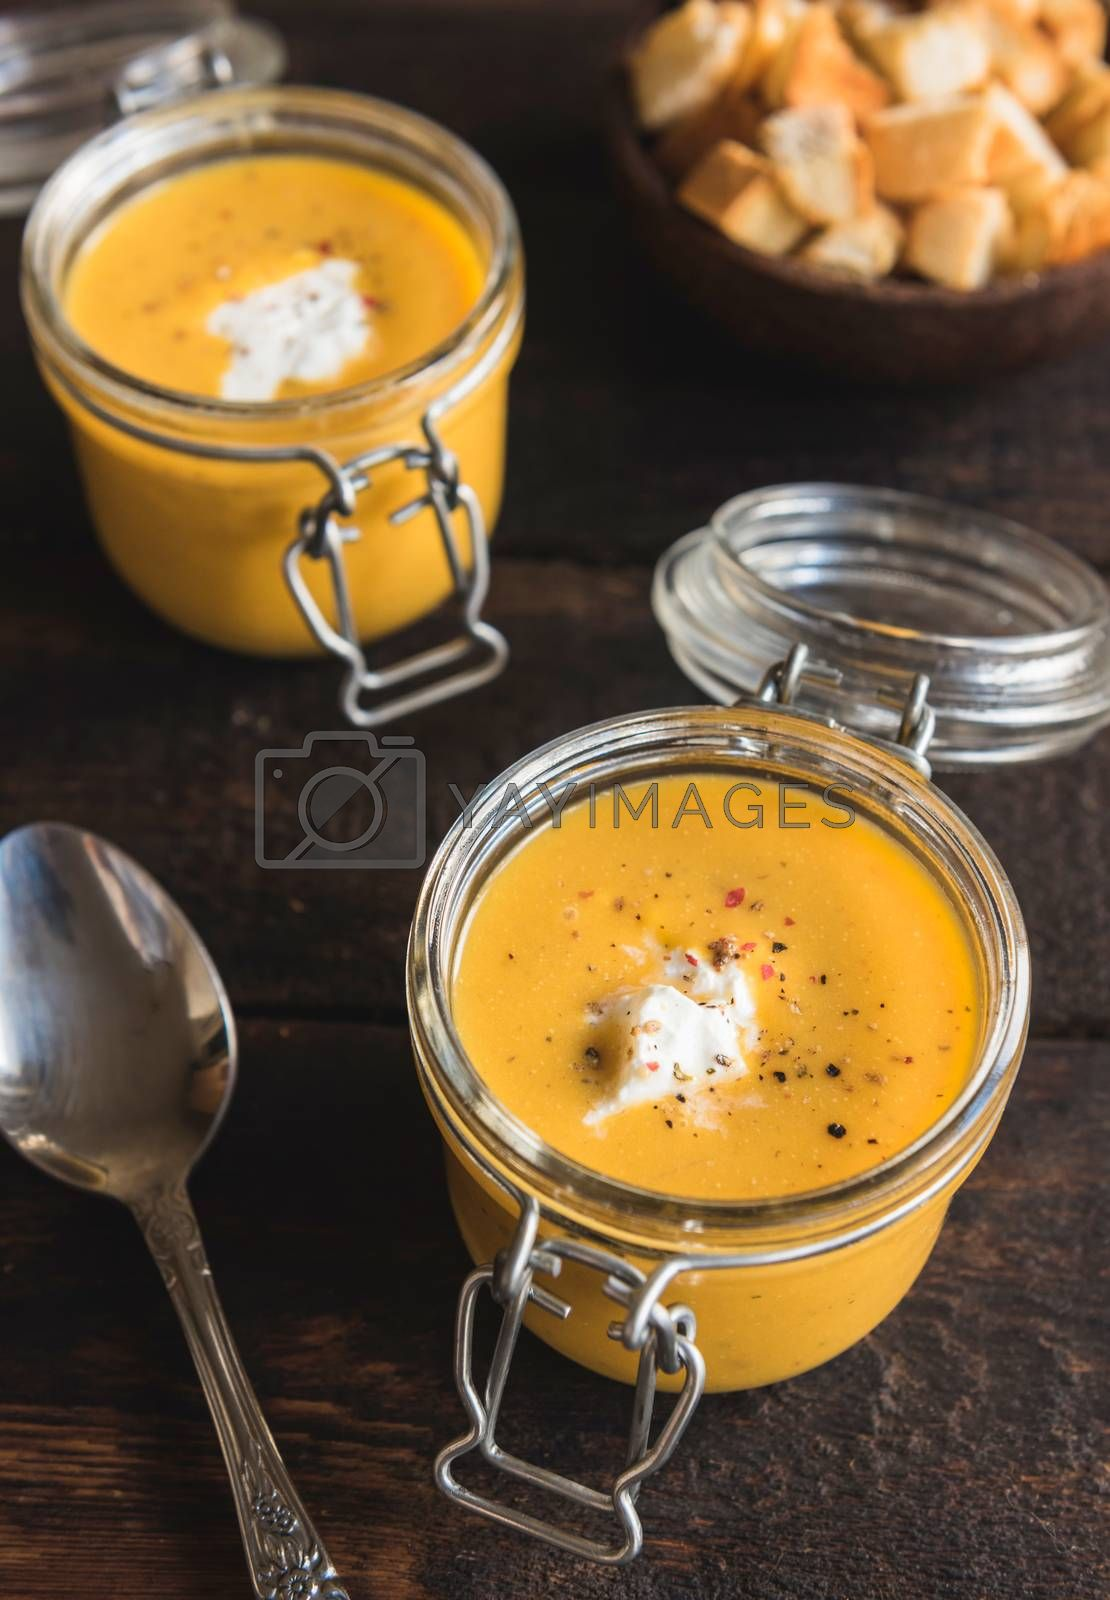 Healthy homemade pumpkin soups in the jars, selective focus